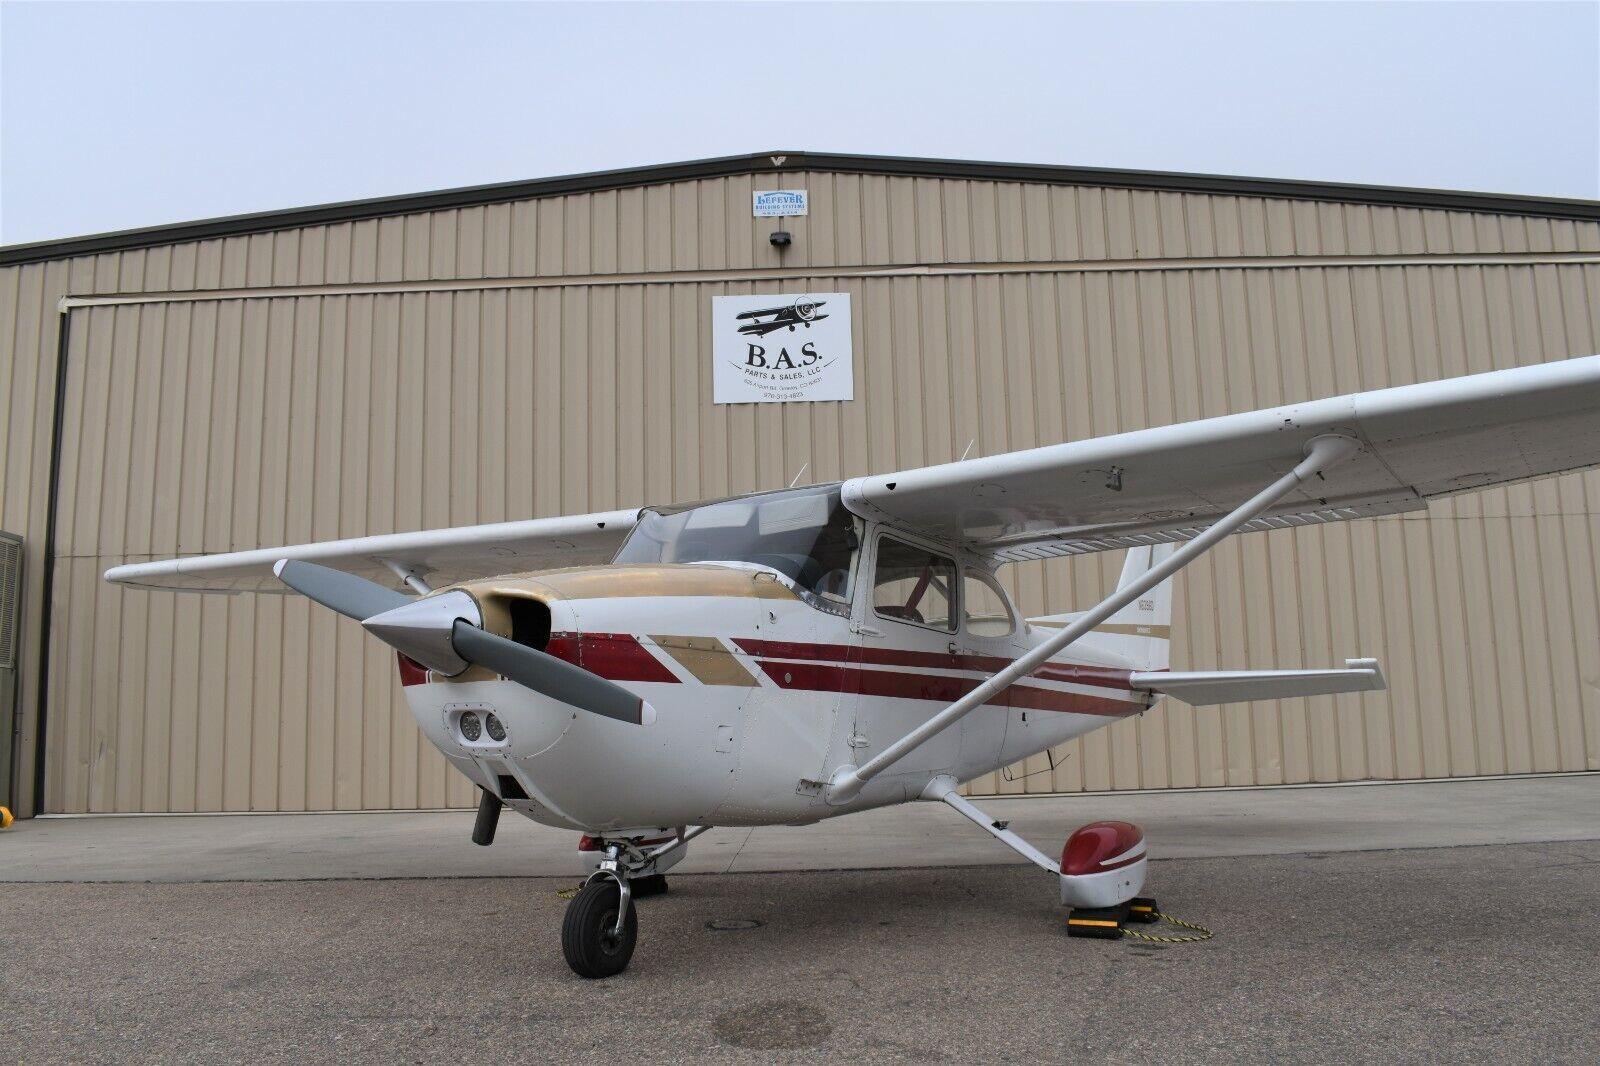 Cessna 172N FLYING AIRCRAFT WITH ASD-B & LYCOMING O-320-D2G